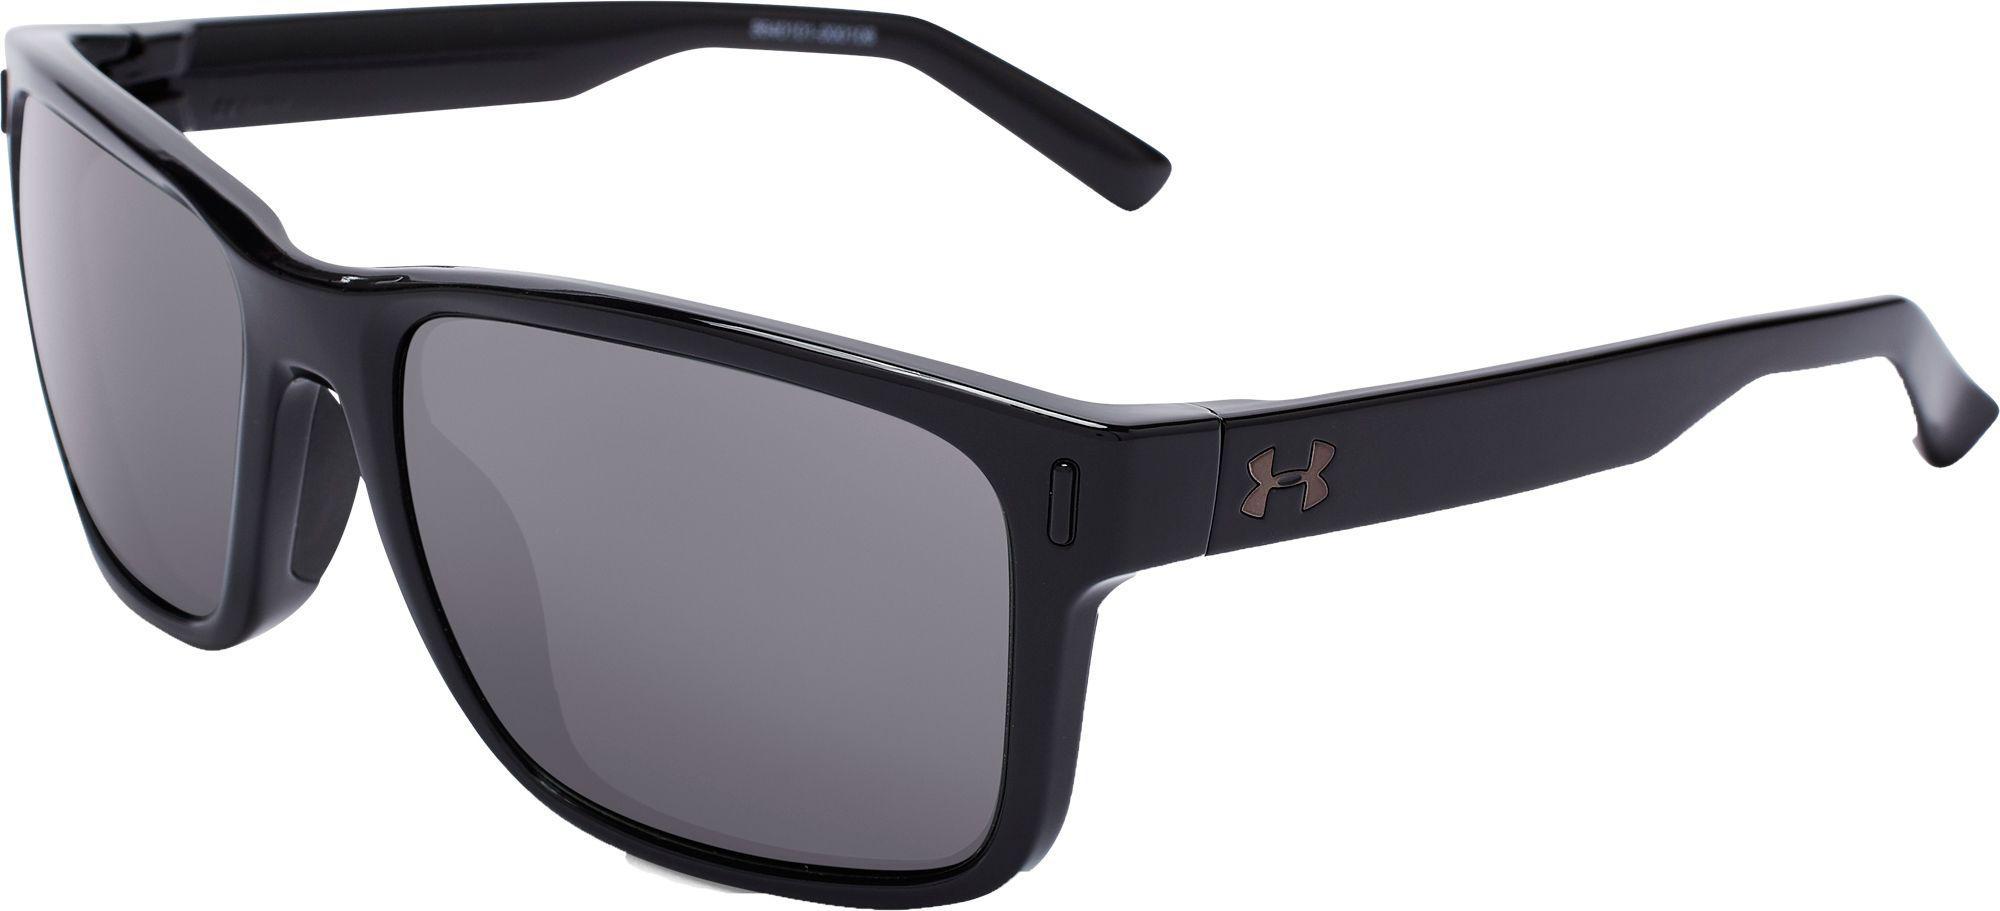 91bb30ec3e6 Lyst - Under Armour Assist Polarized Sunglasses in Black for Men